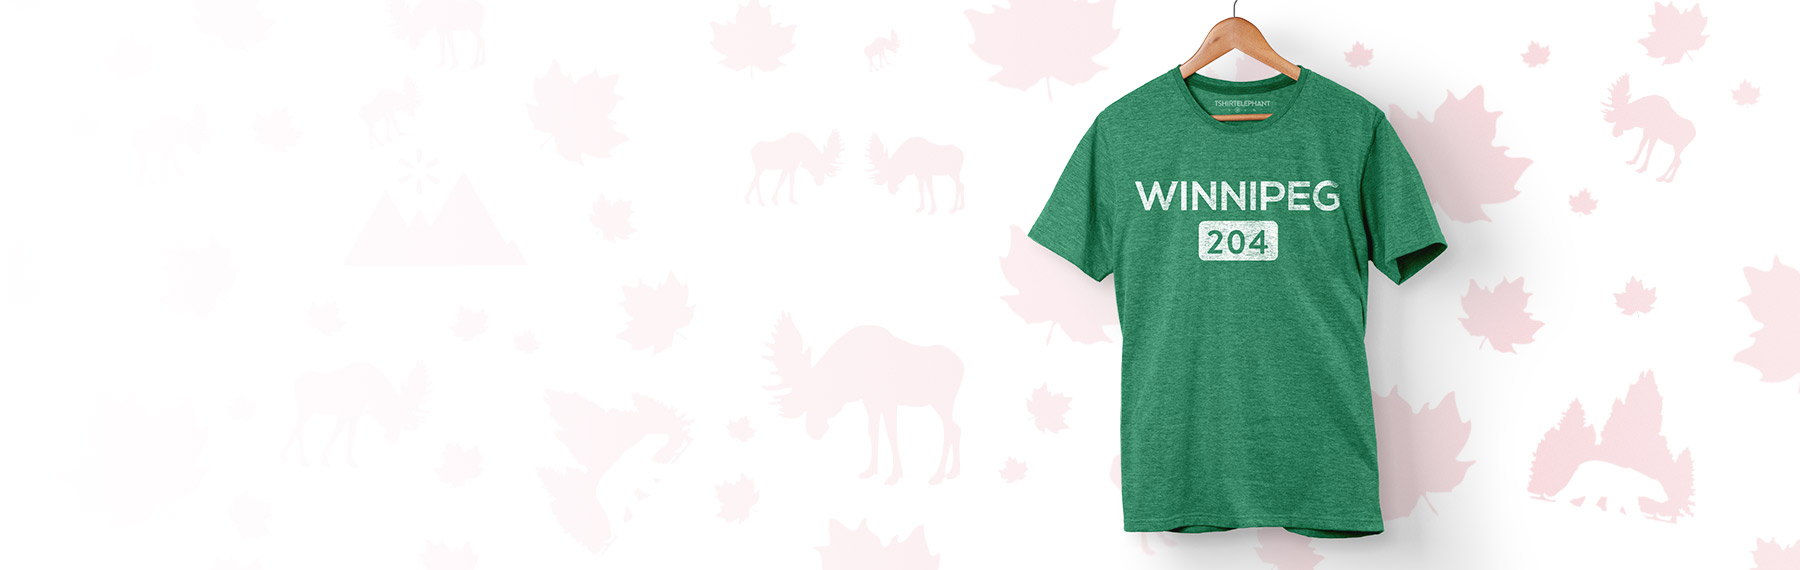 Shirt design maker canada - Custom T Shirts Winnipeg